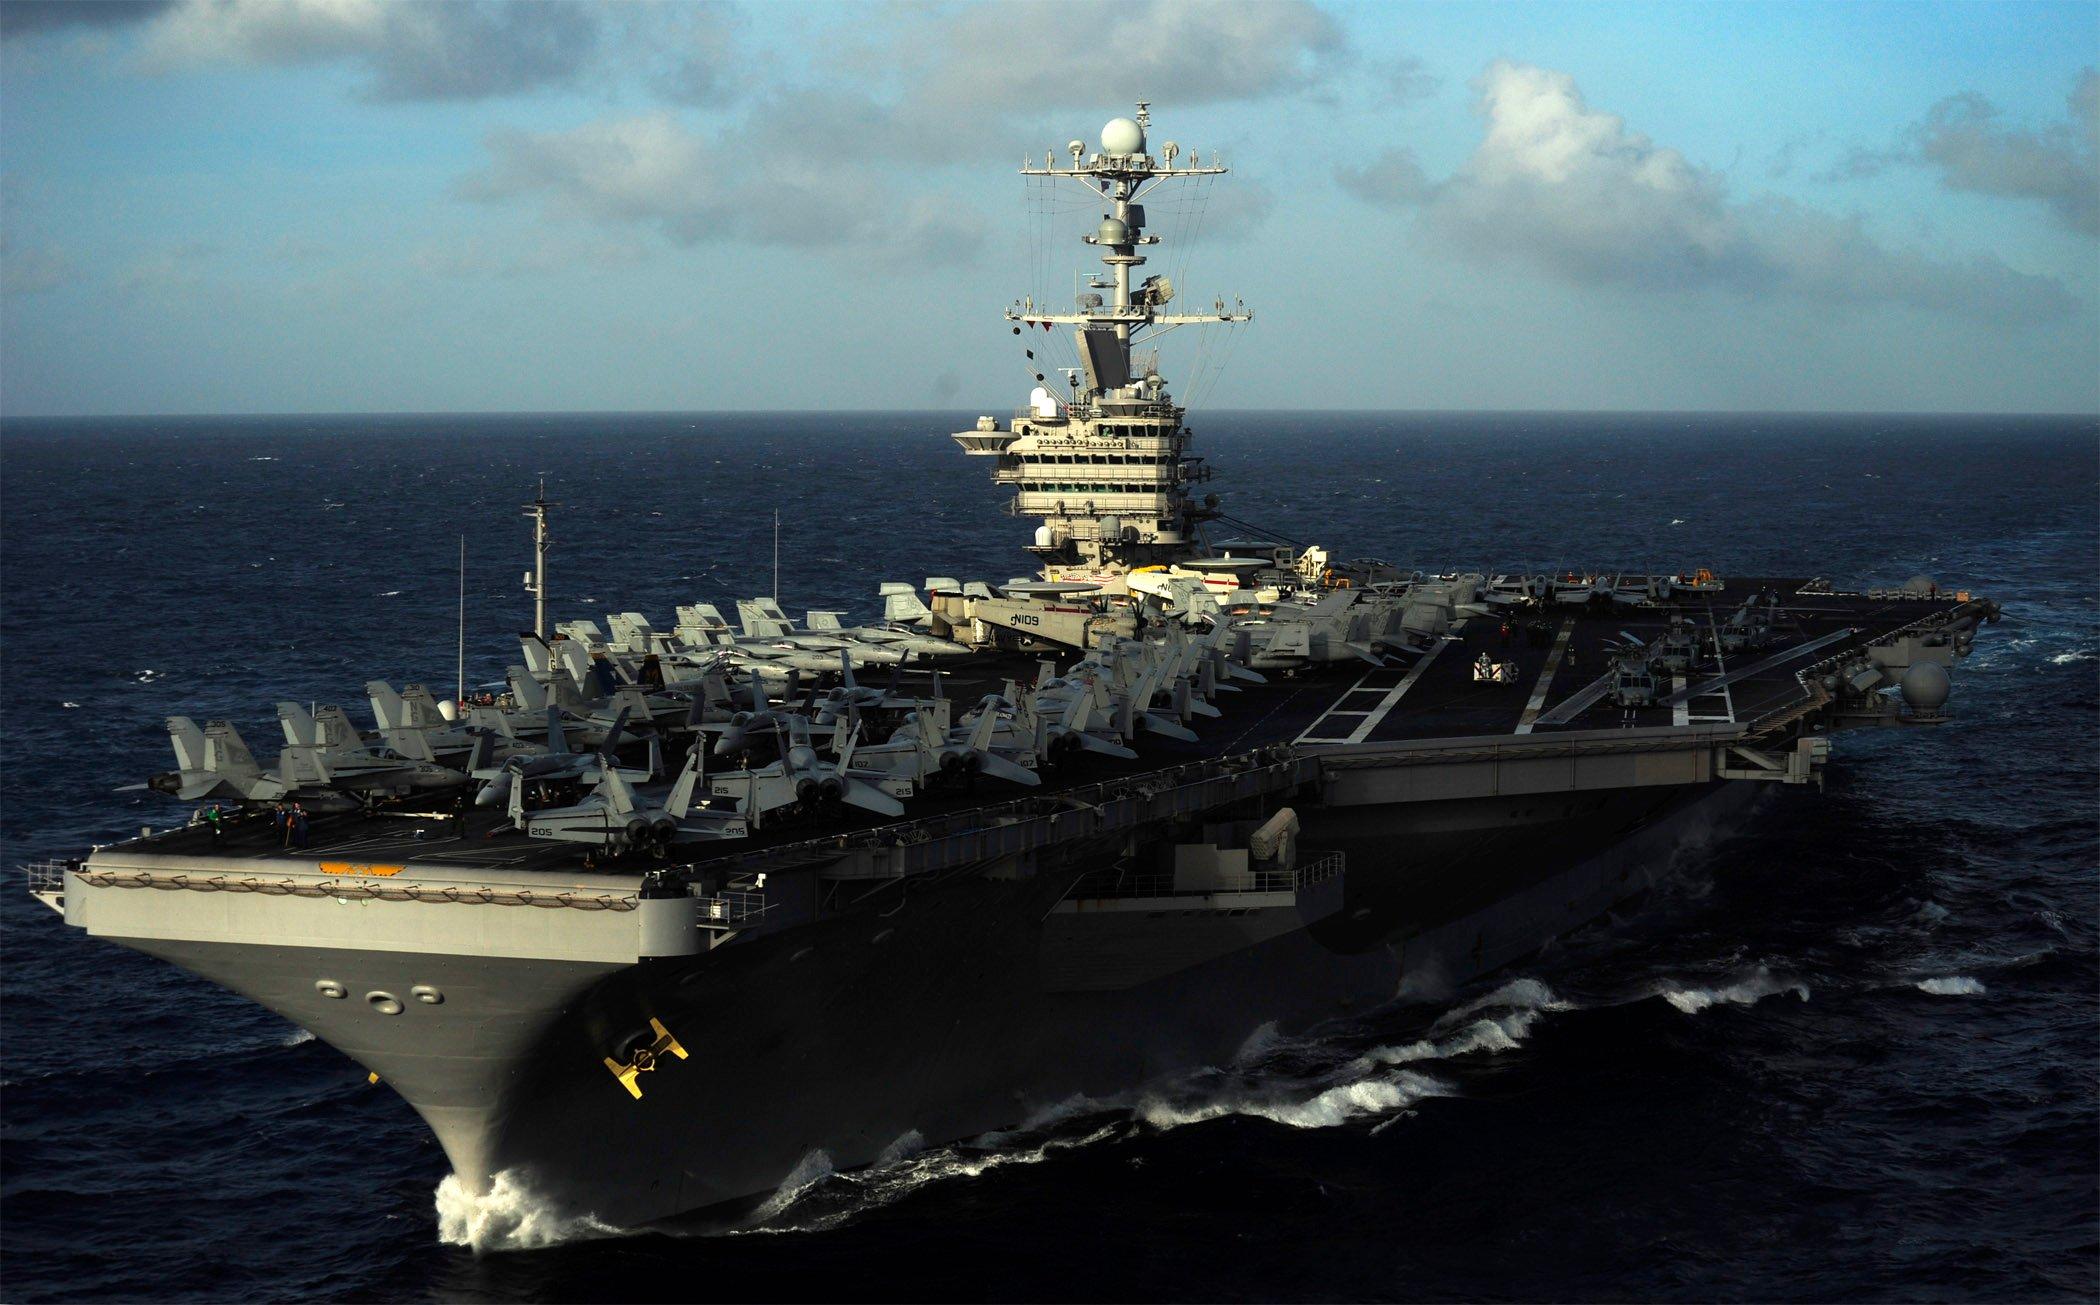 EKTAKTH EIΔΗΣΗ: Iρανικά πλοία εκτόξευσαν πυραύλους κατά αεροπλανοφόρου των ΗΠΑ – «Κόλαση» στον Περσικό Κόλπο – Βίντεο